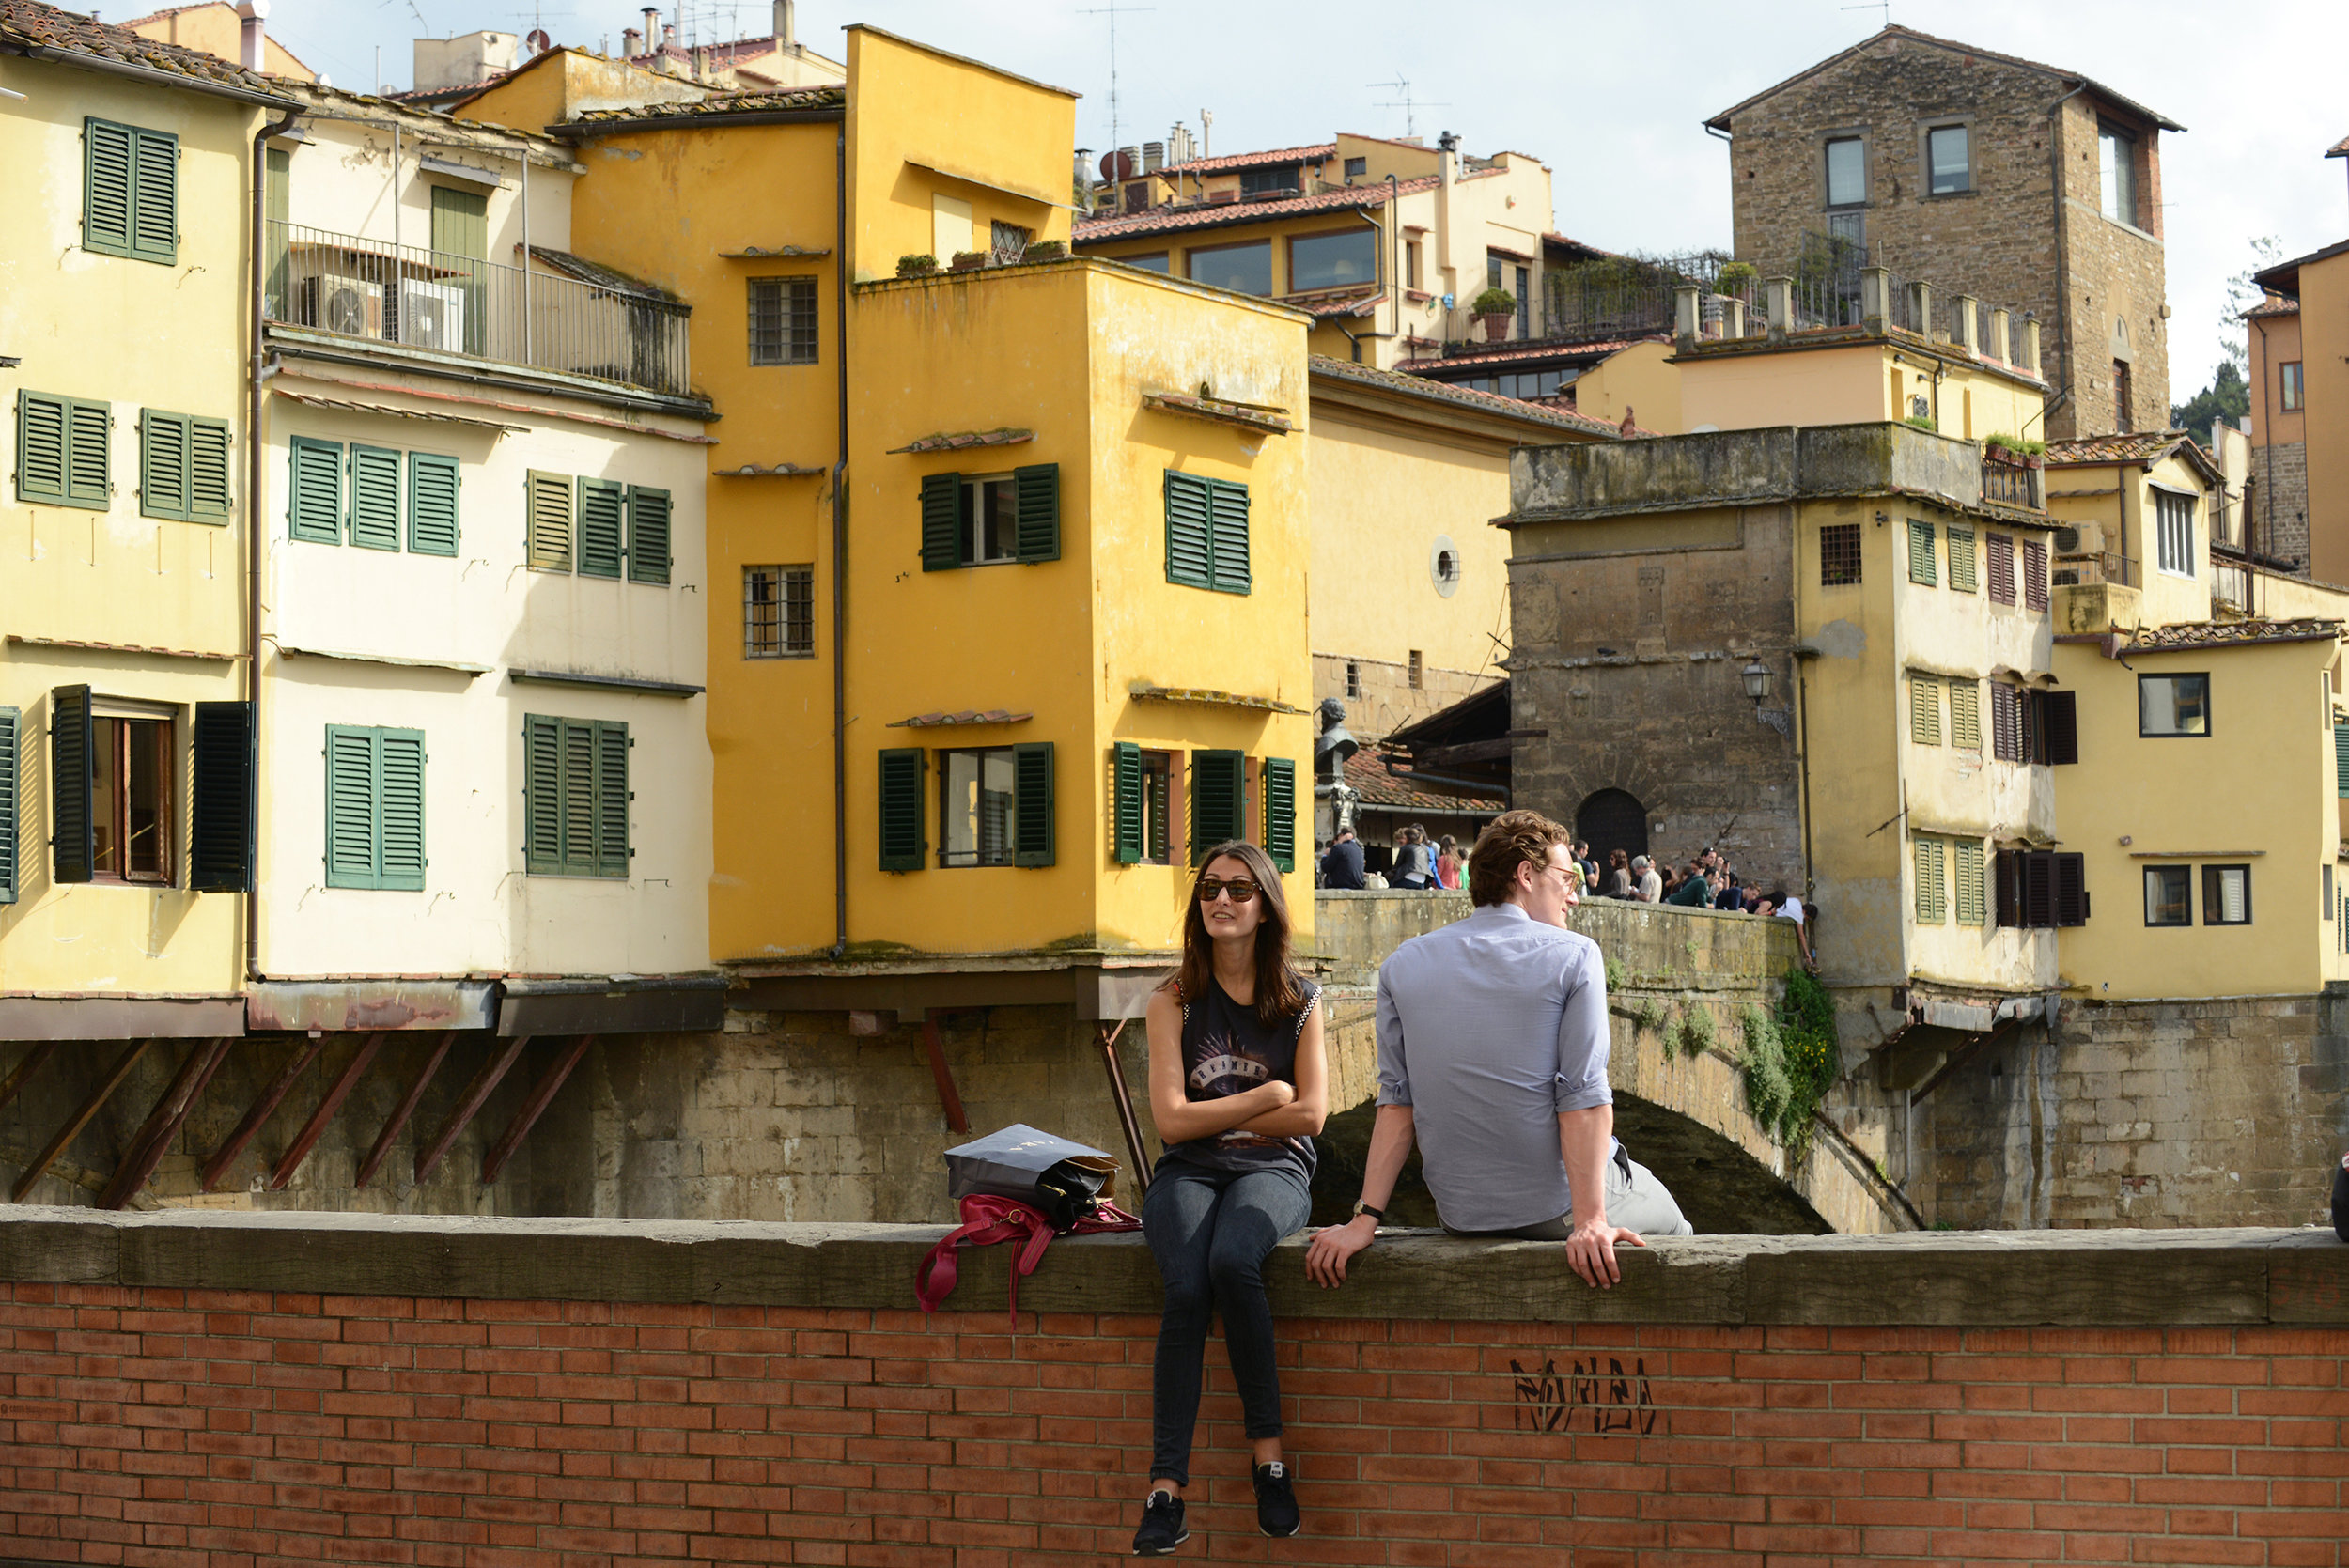 Italia, Firenze, Toscana, Arnojoki